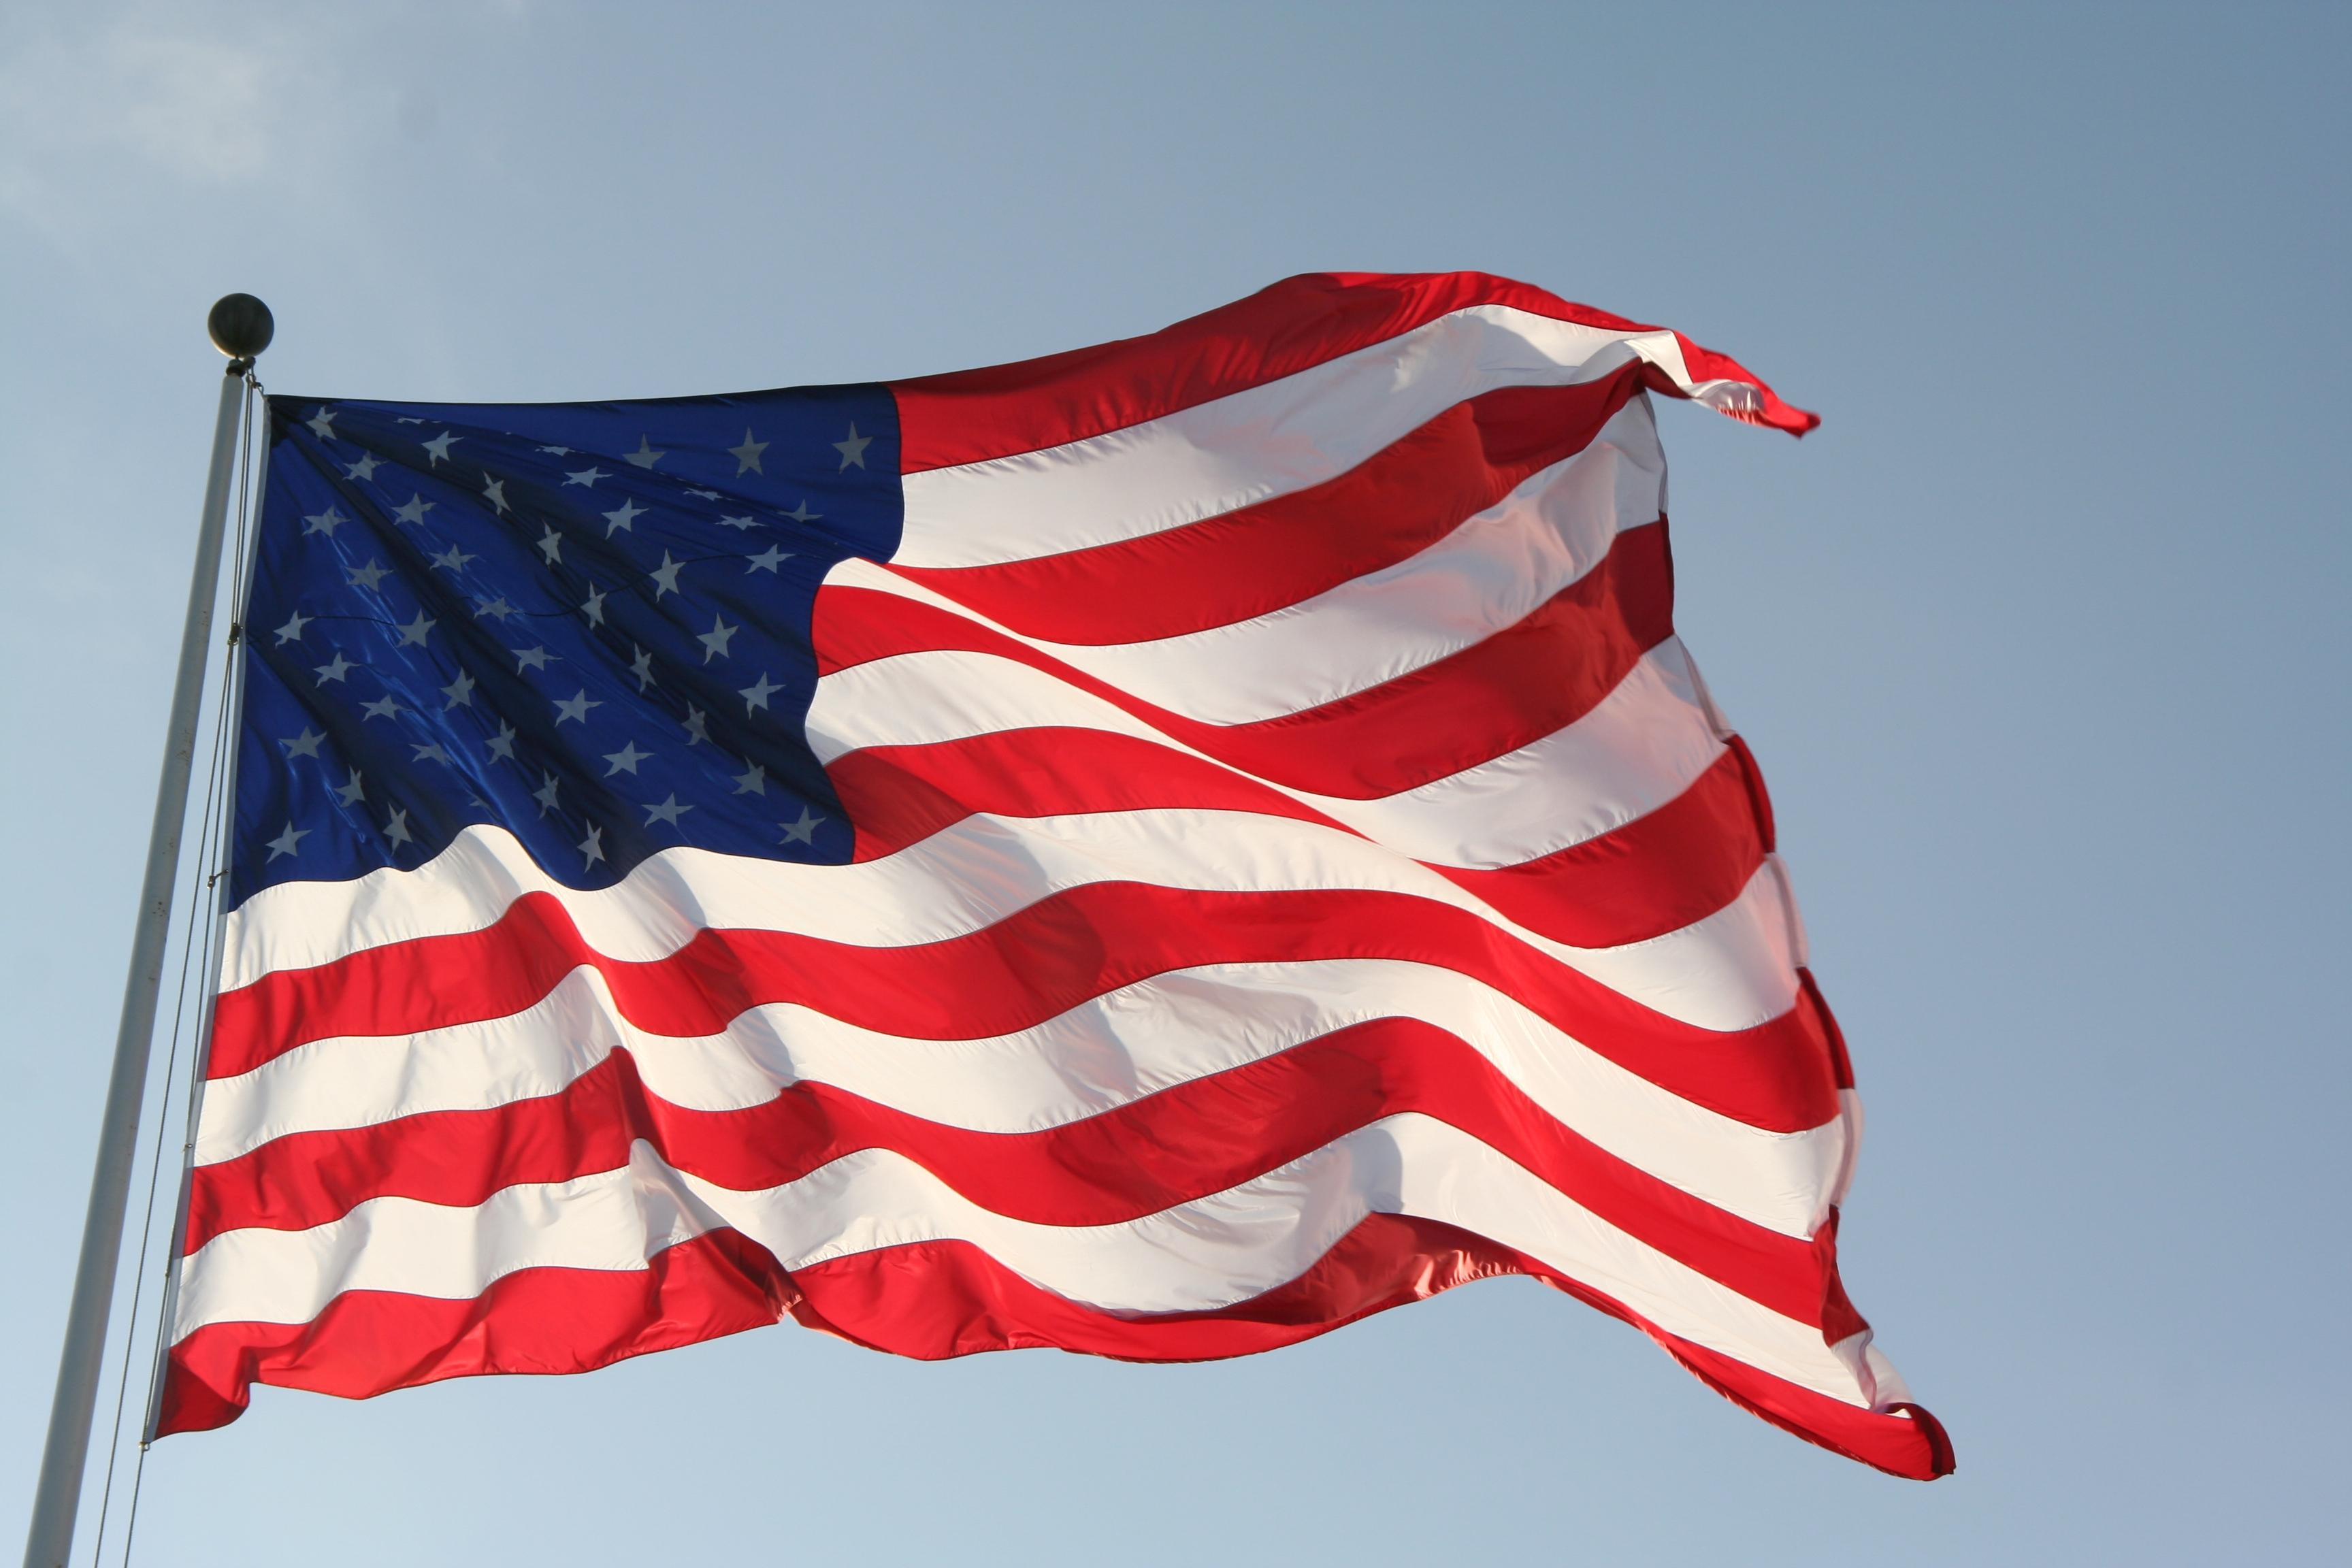 7月4日 独立記念日 (Independence Day)